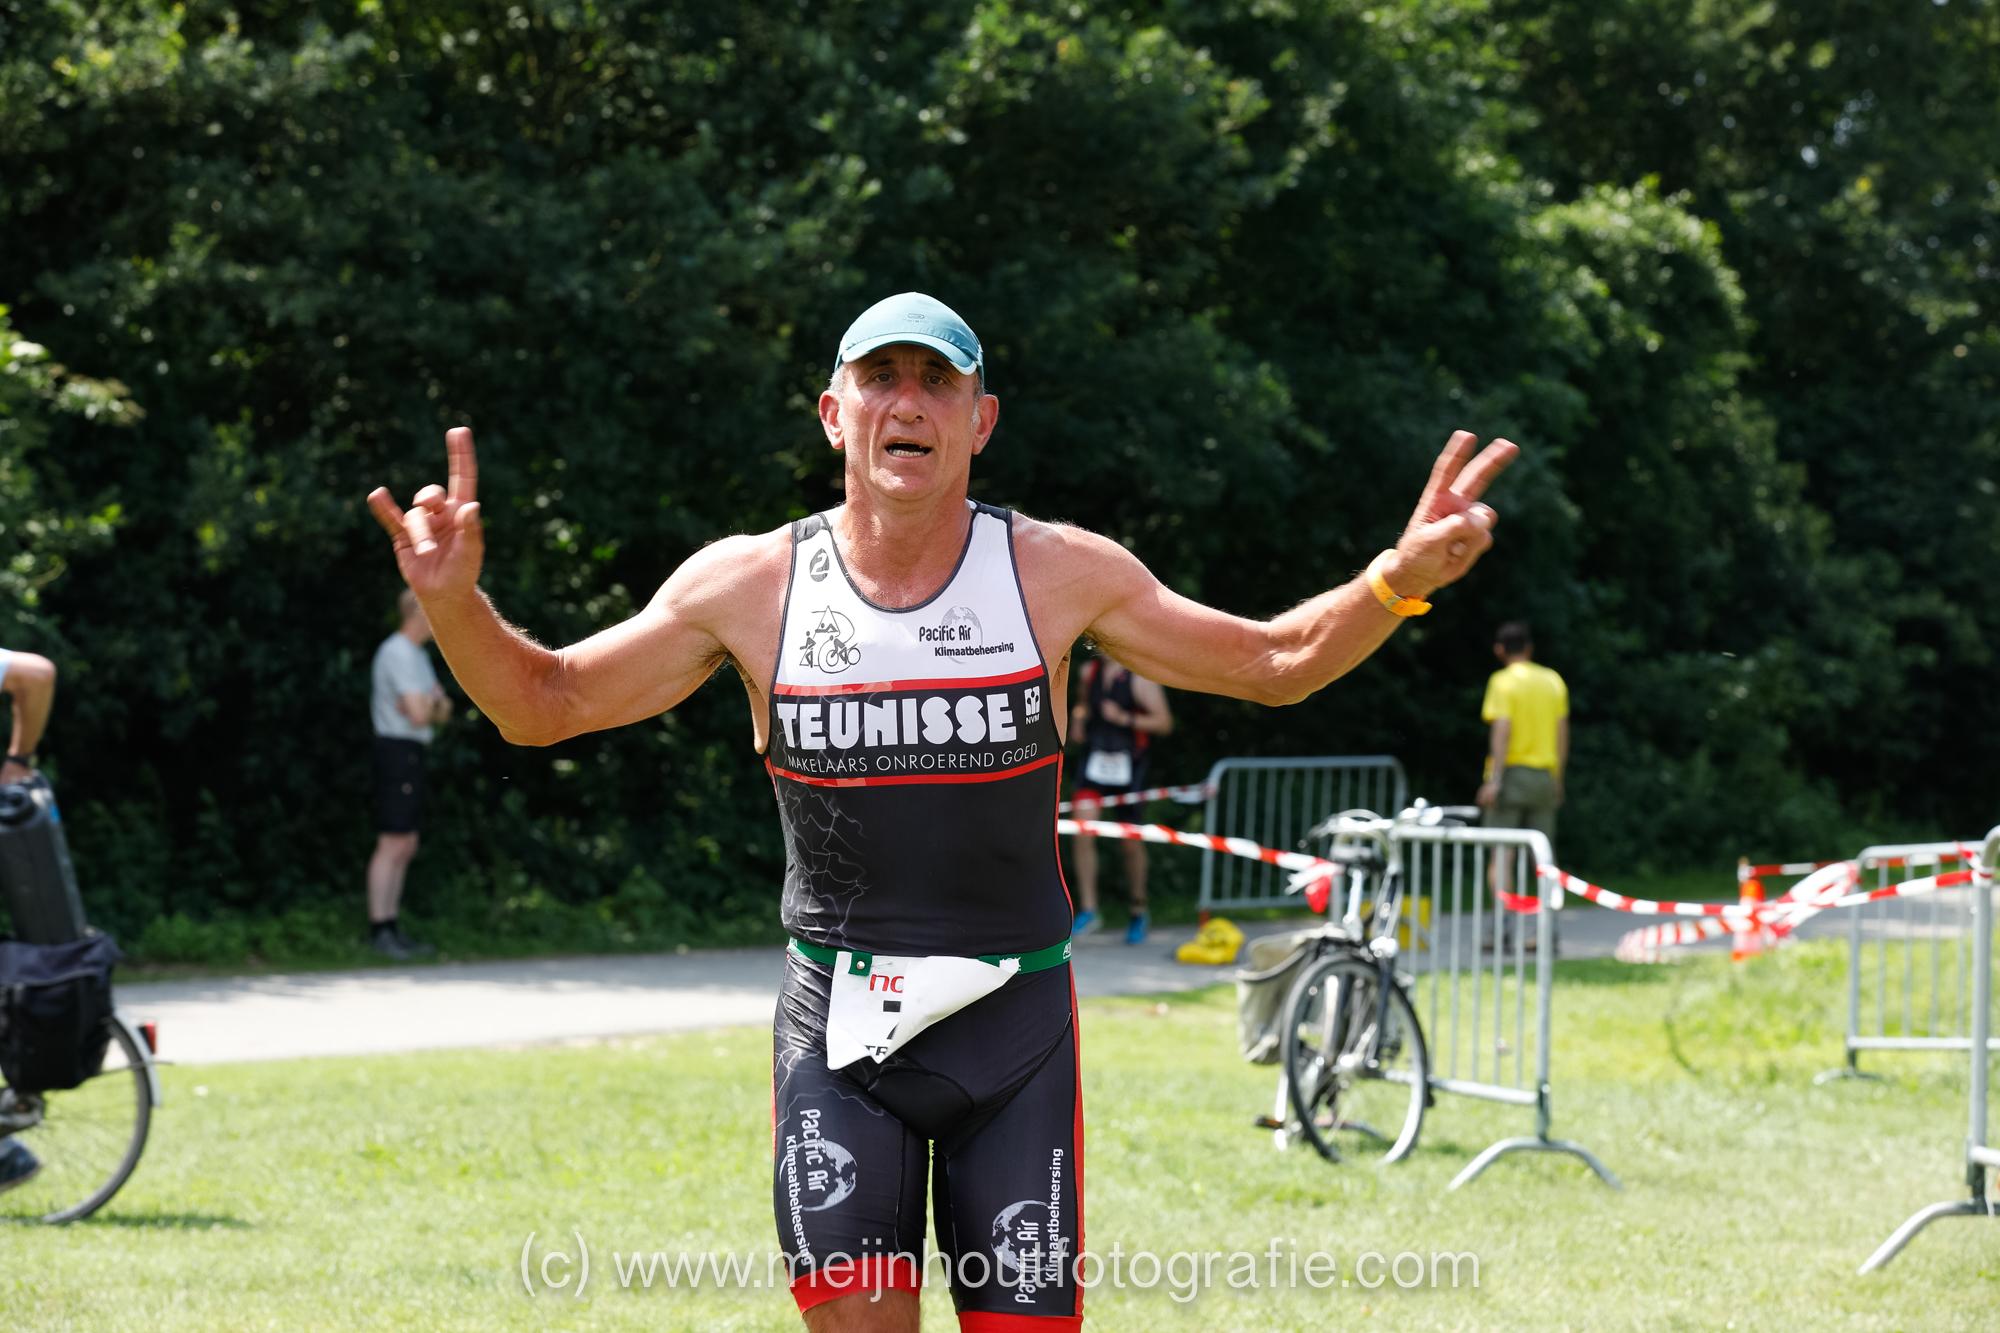 _MG_8960 Triathlon Huizen 2018 #64.jpg